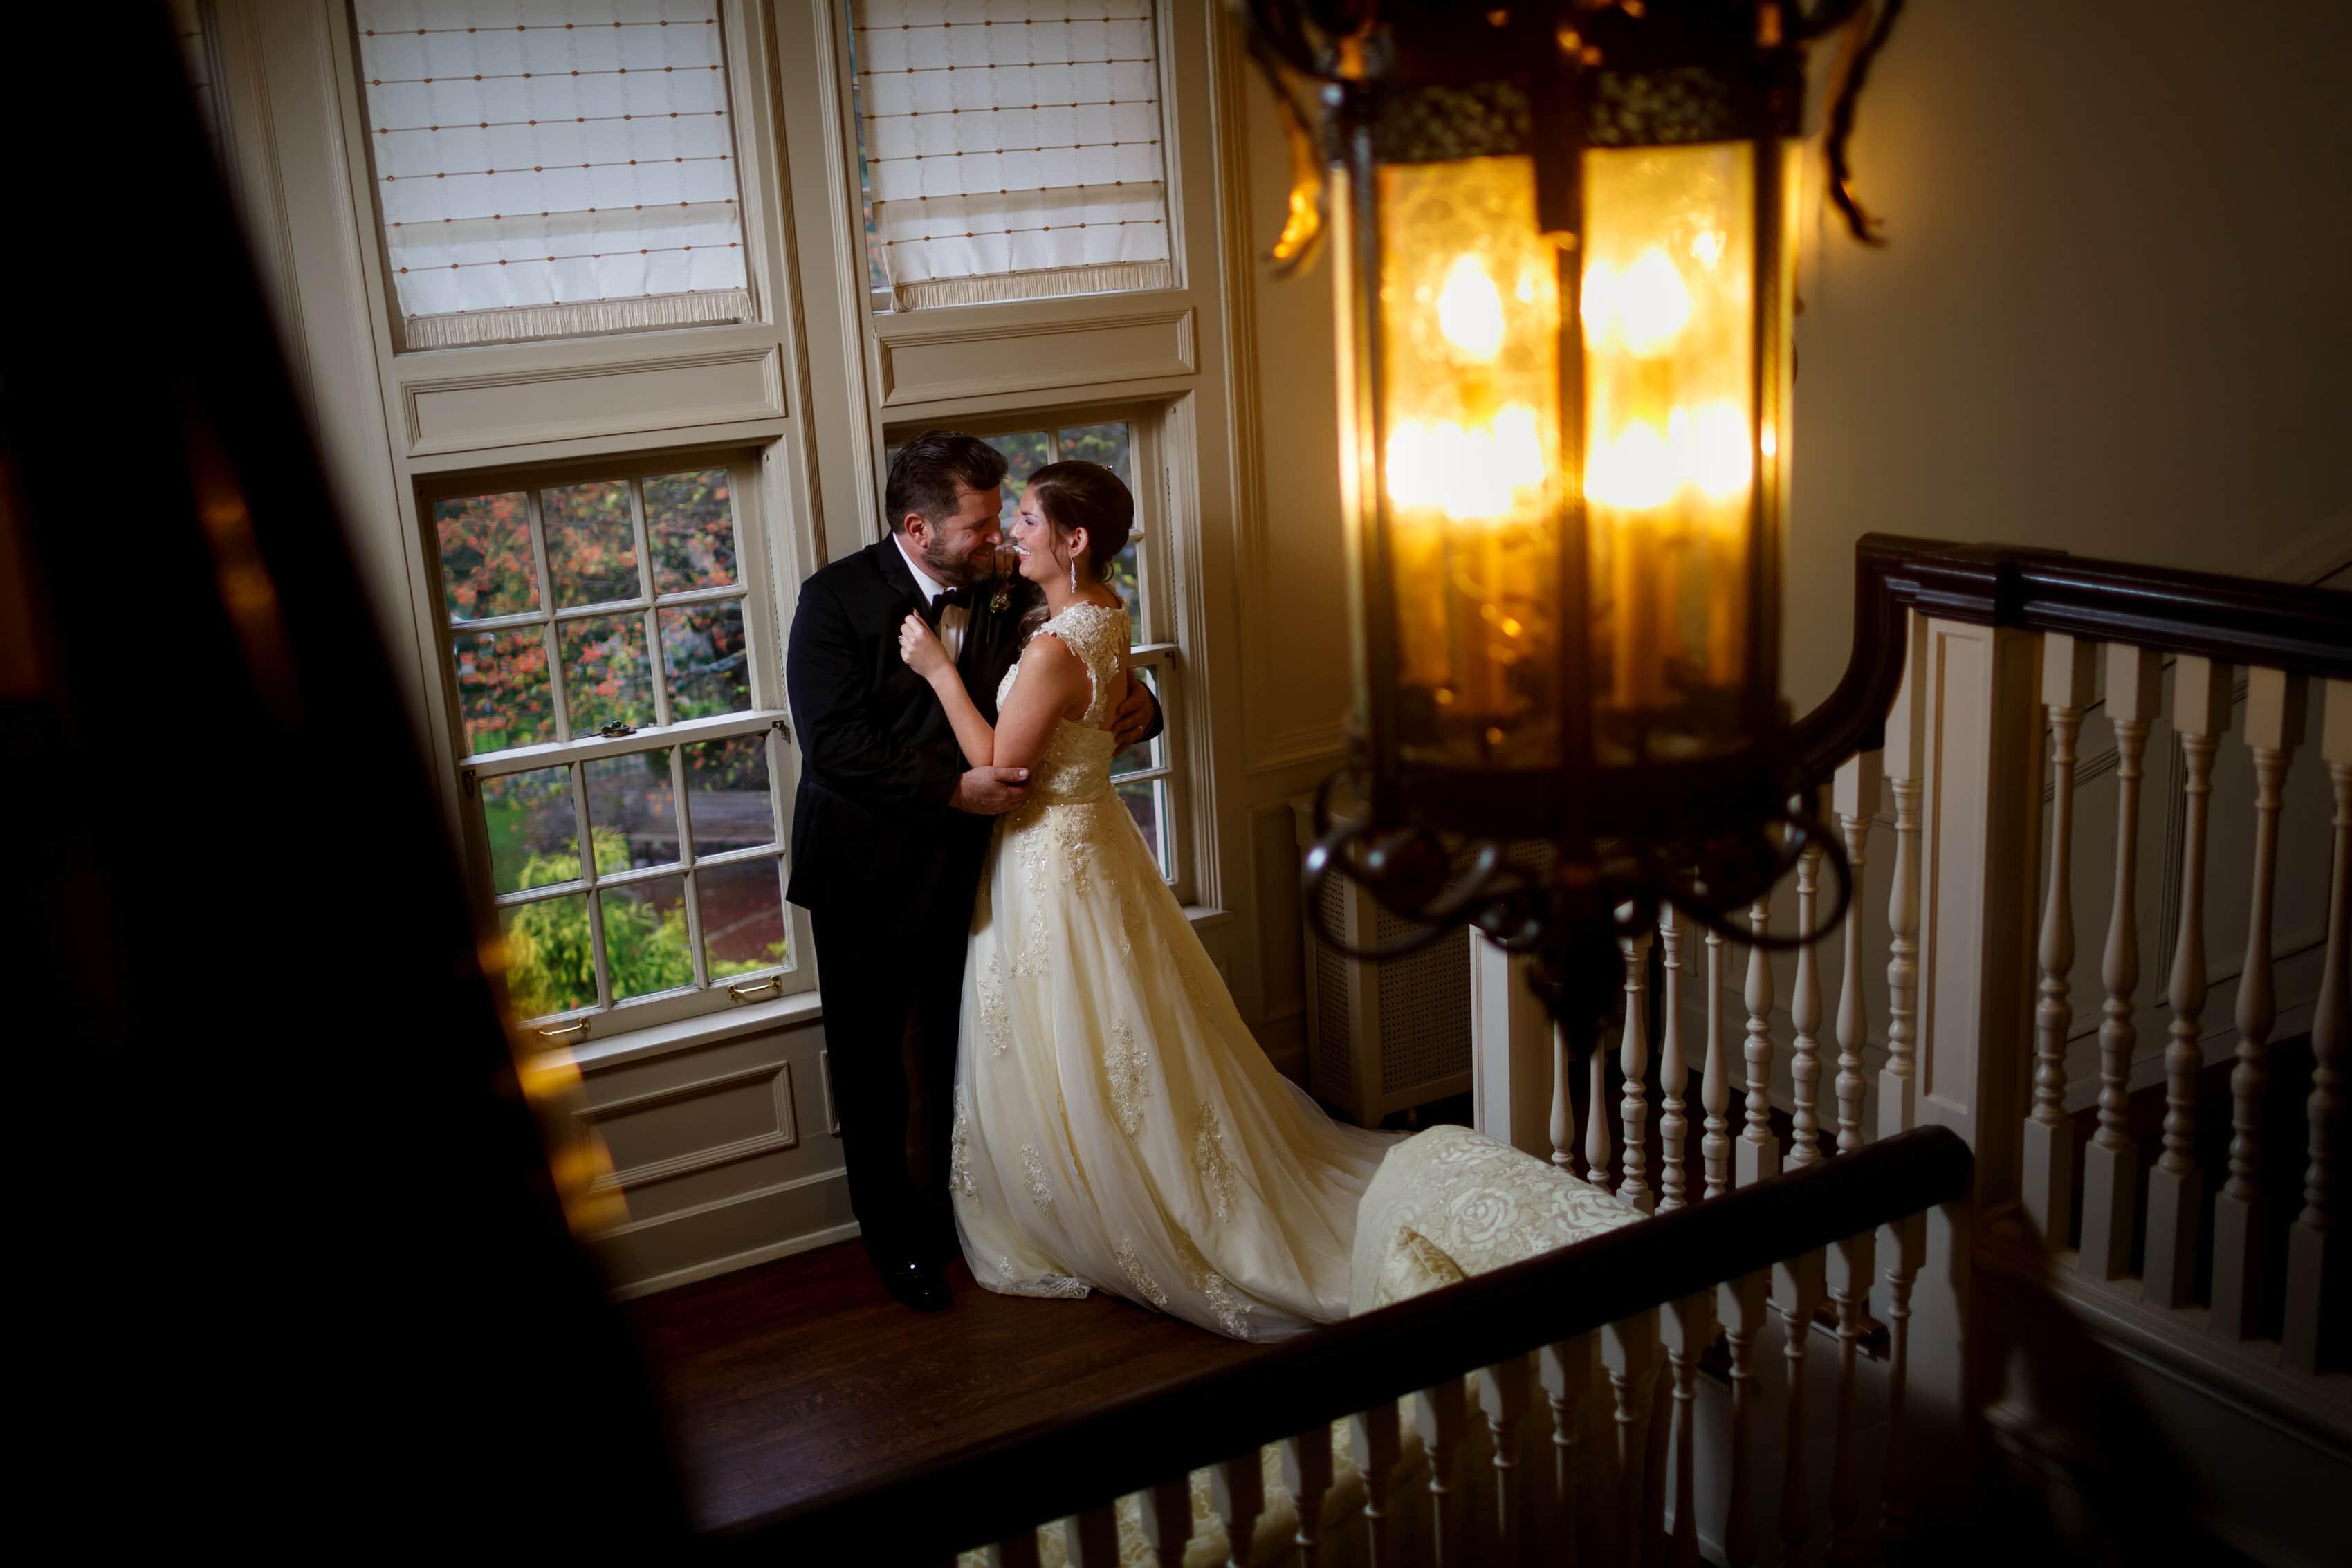 Cheney Mansion Wedding Photos: Lily & Steve